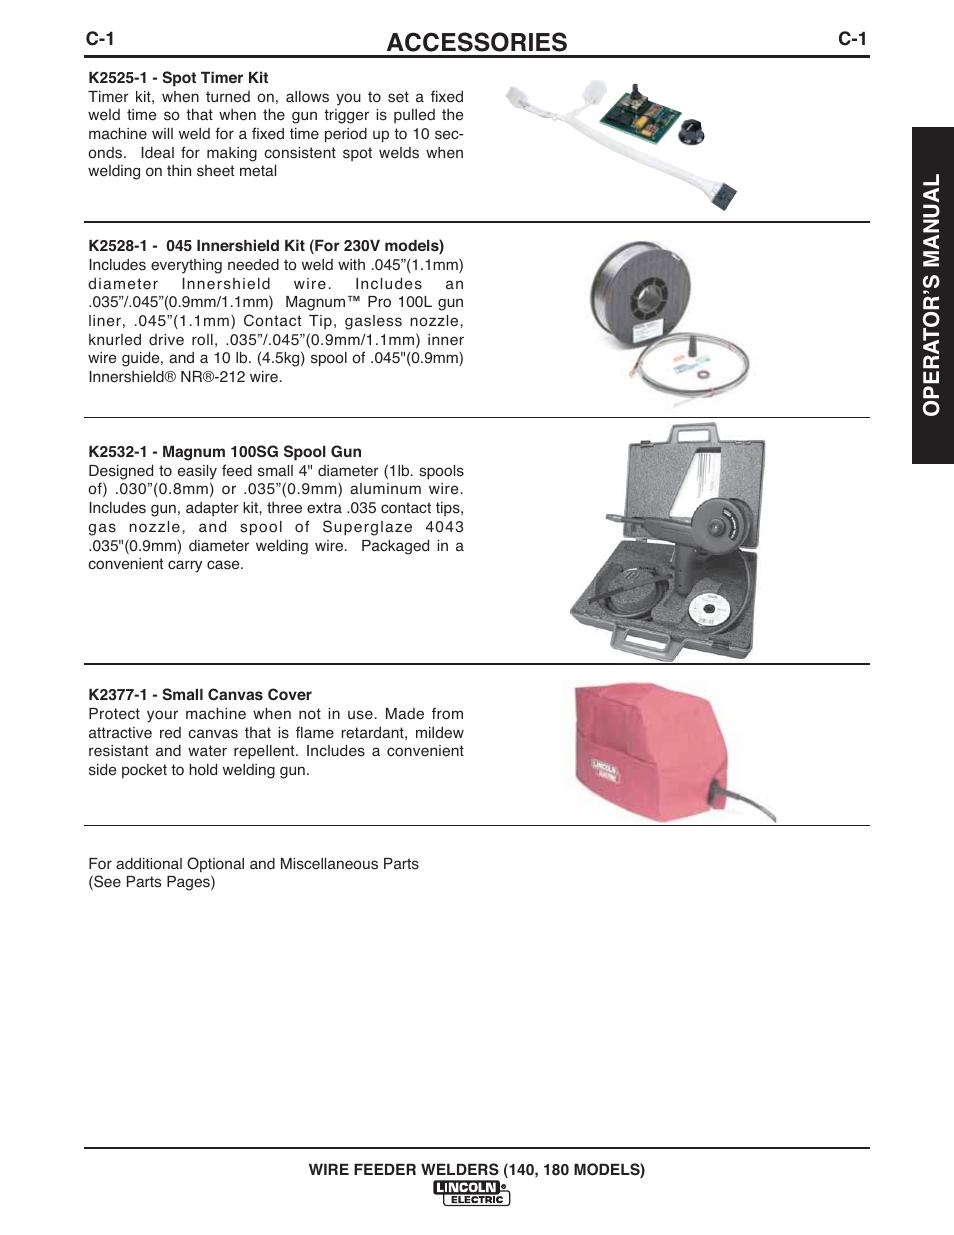 Accessories Lincoln Electric Imt10100 Wire Feeder Welder 140 180 Welding Gun Diagram User Manual Page 21 96